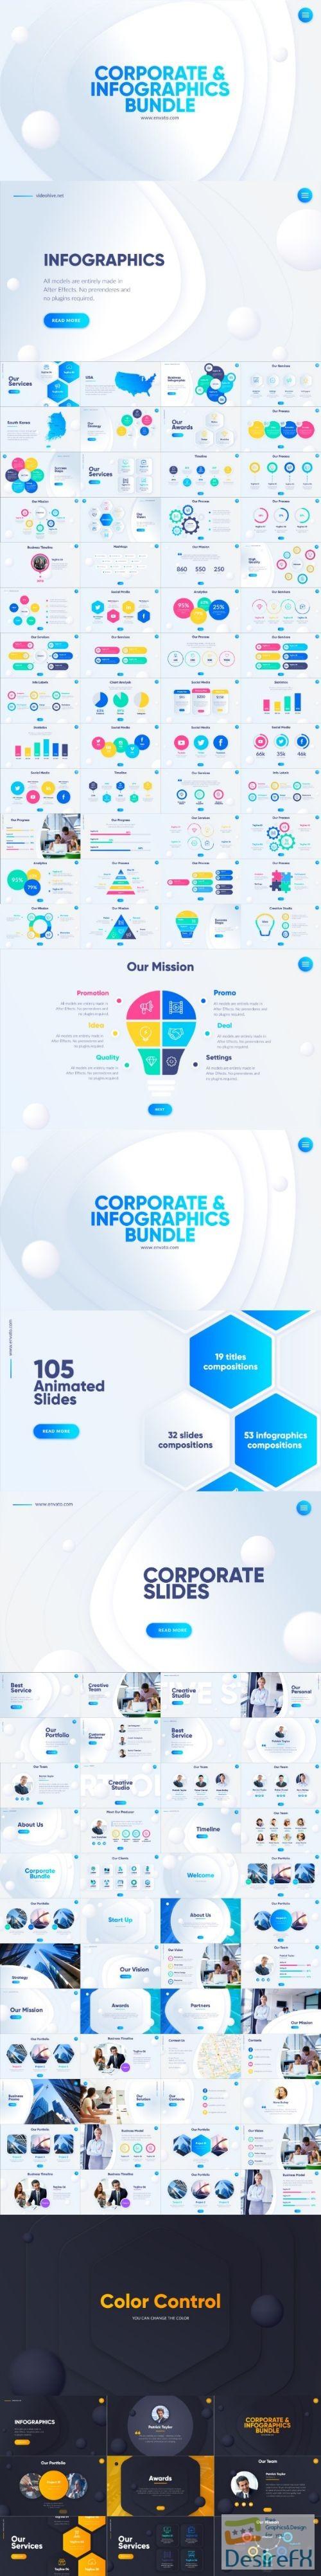 Videohive Corporate Bundle 21669208